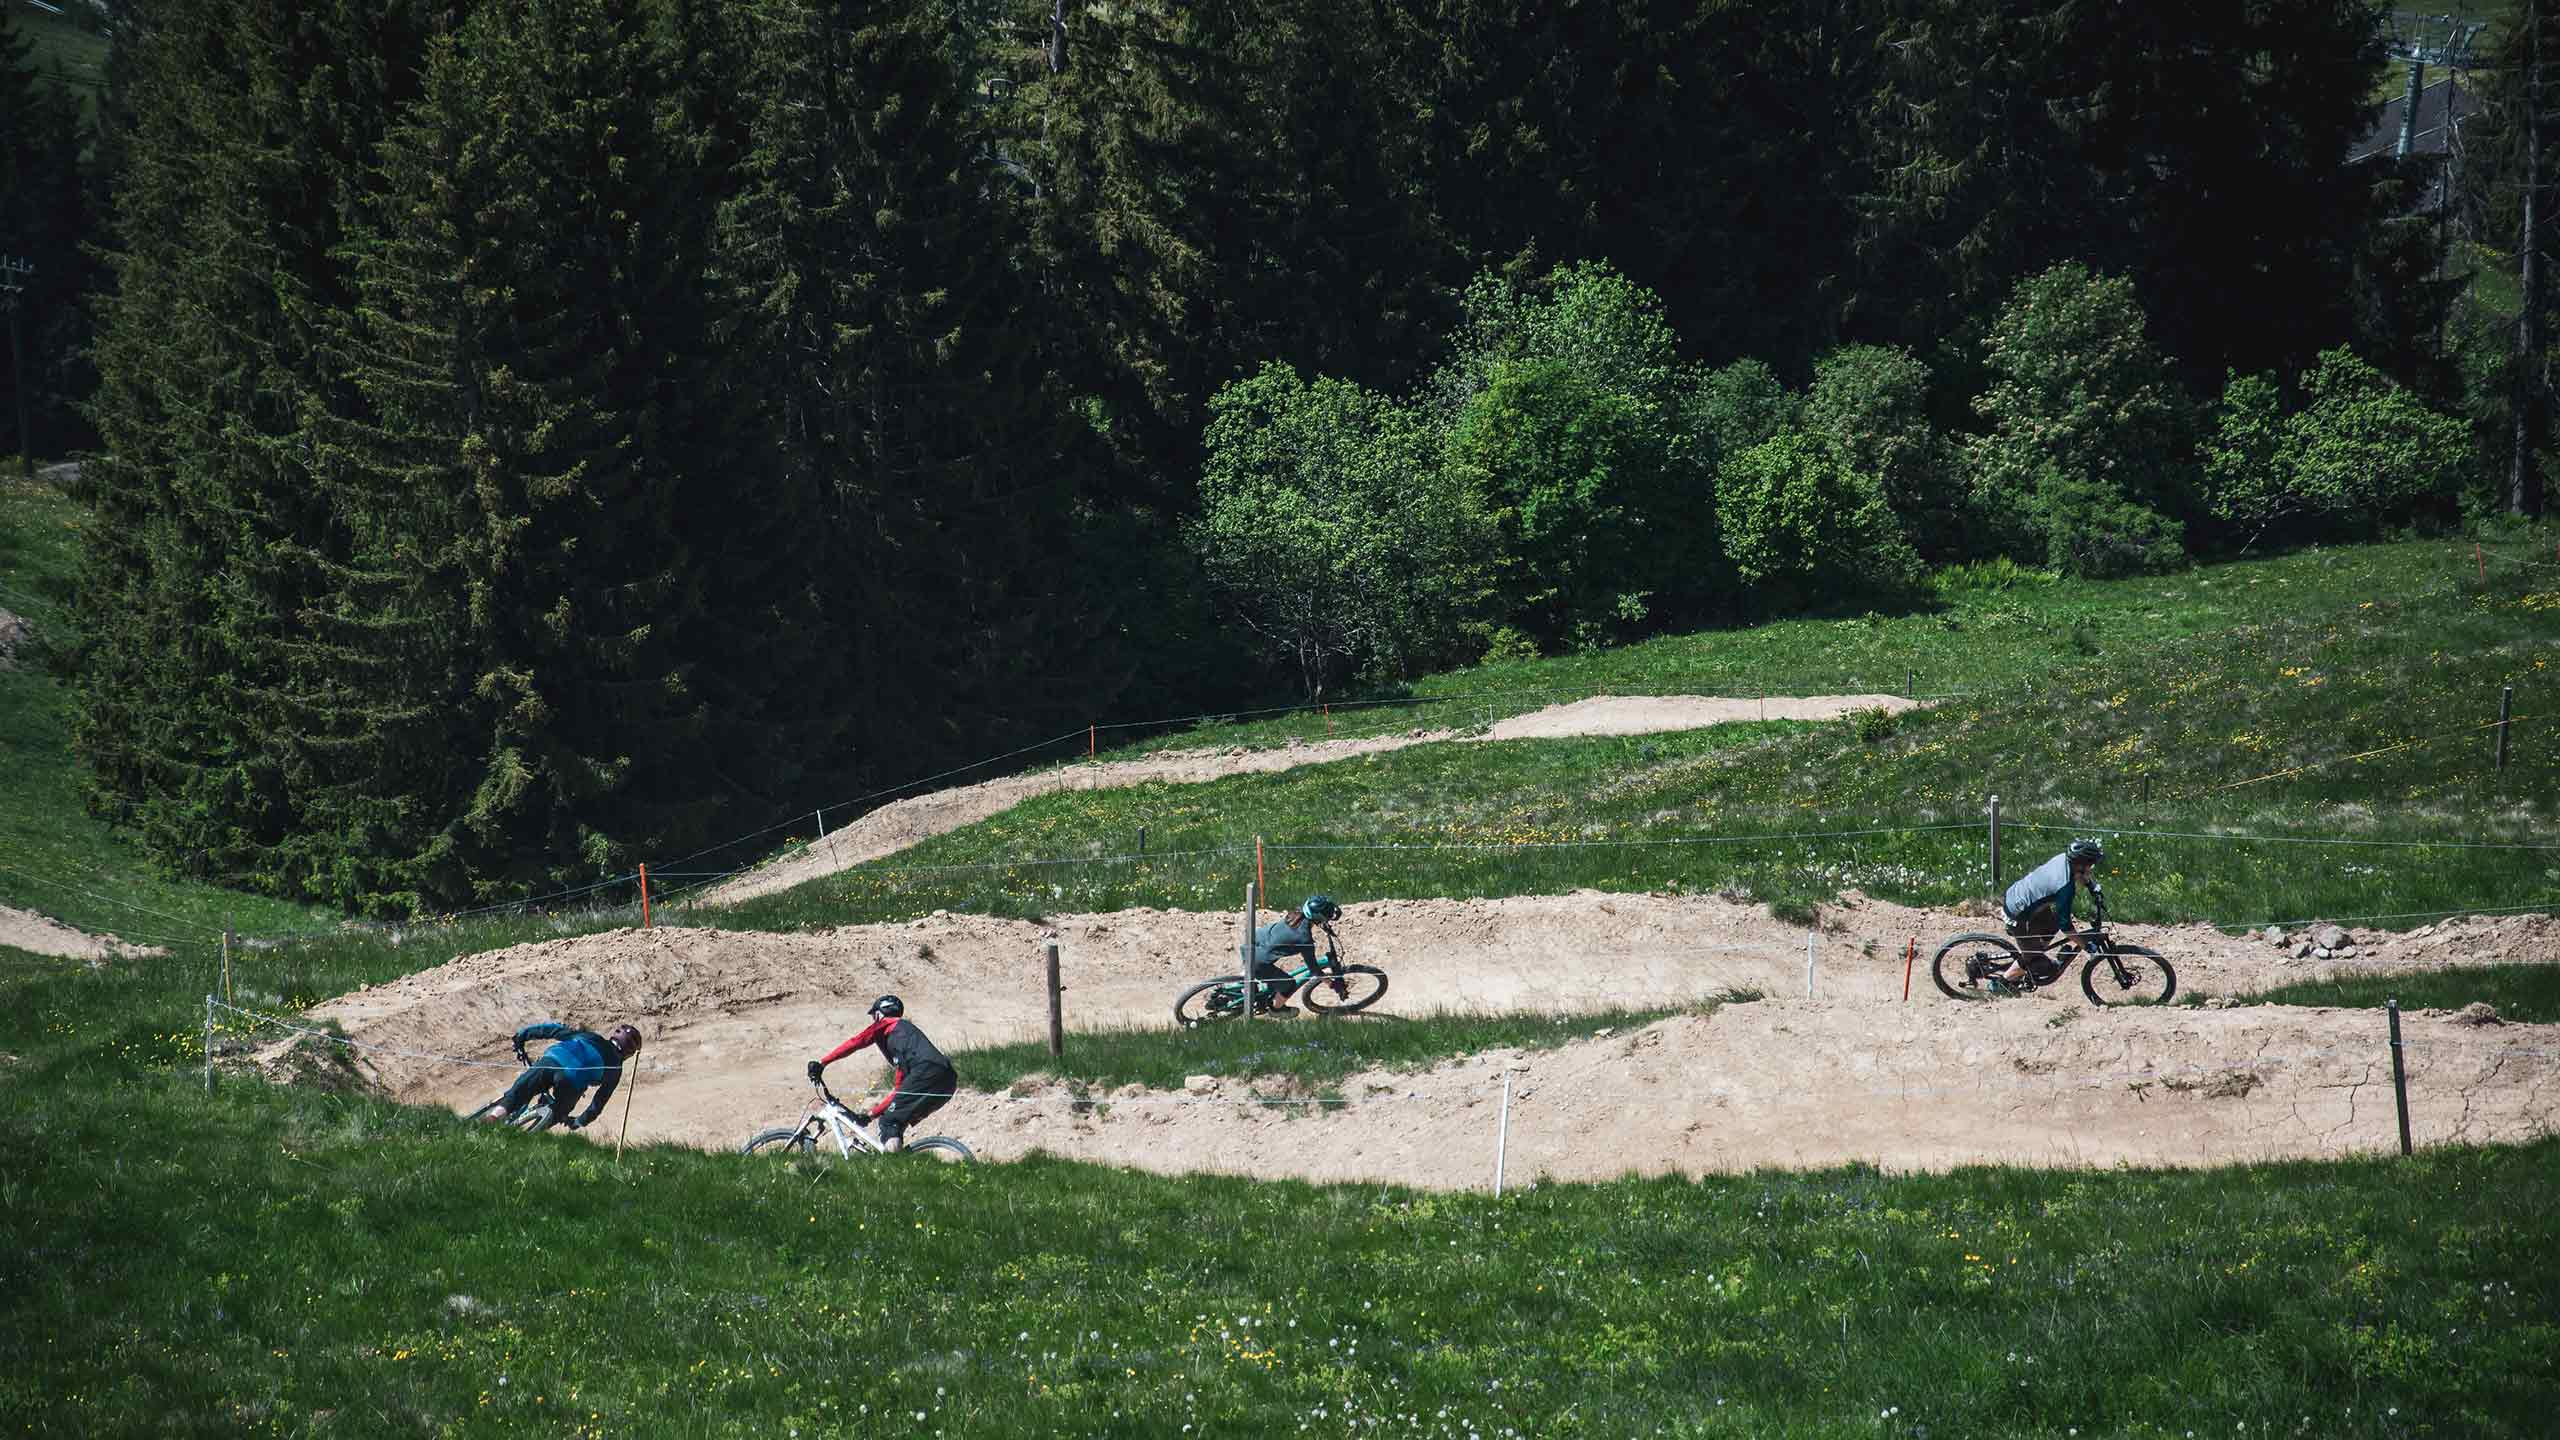 downhill-bikepark-wiriehorn-abfahrt-richtung-tal.jpg